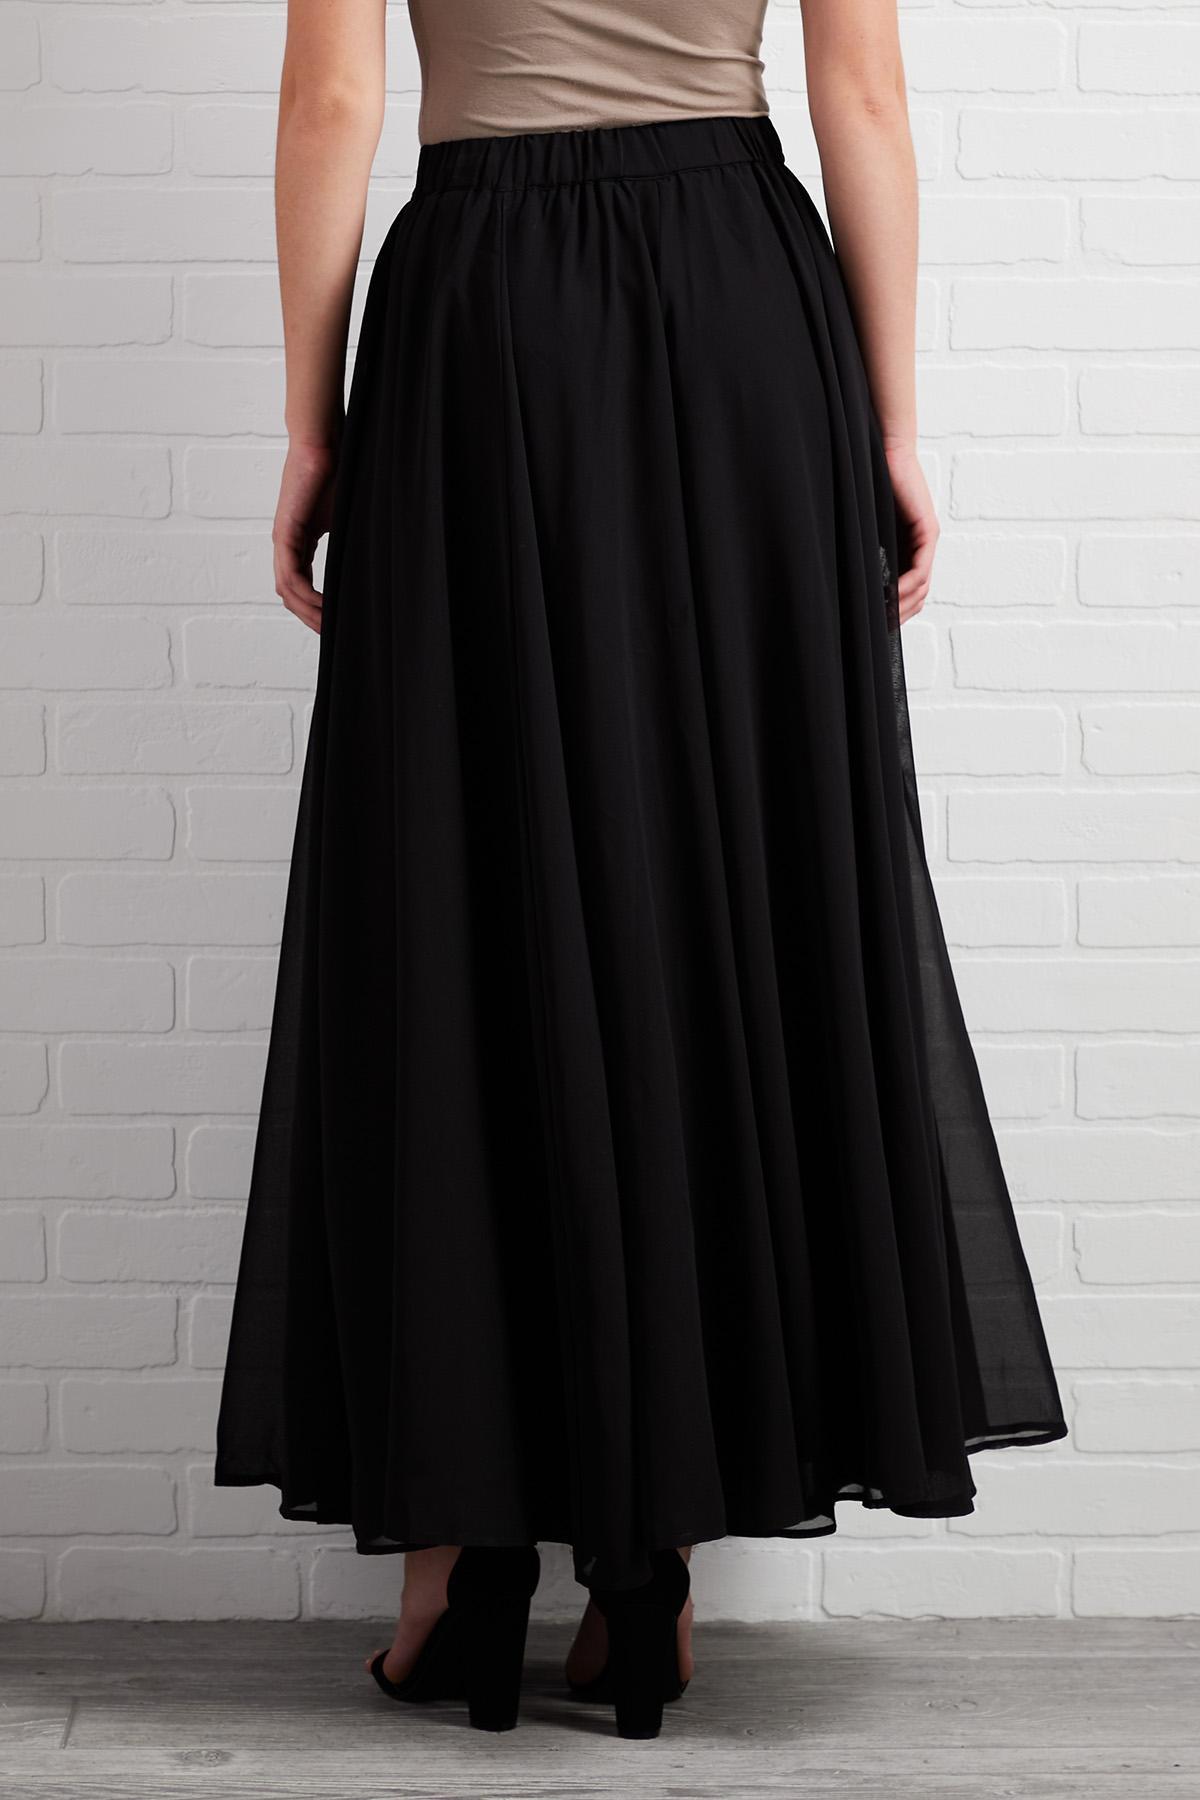 So Long For Now Maxi Skirt